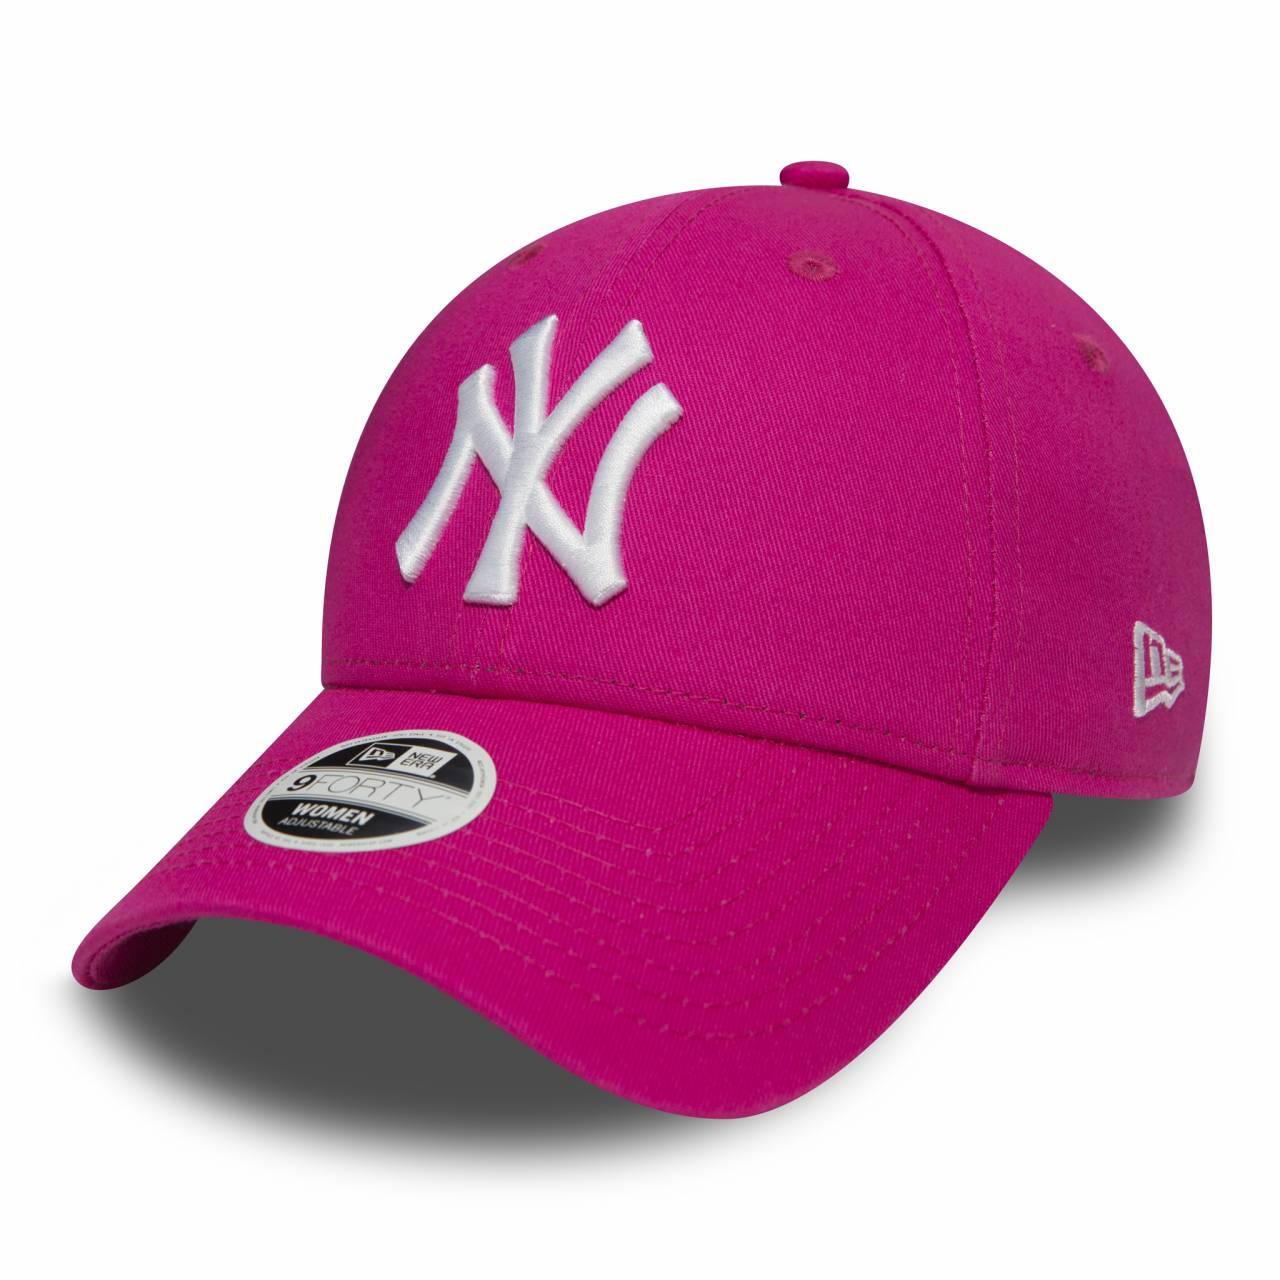 11157578 9FORTY WOMAN NEW YORK YANKEES PINK CAP